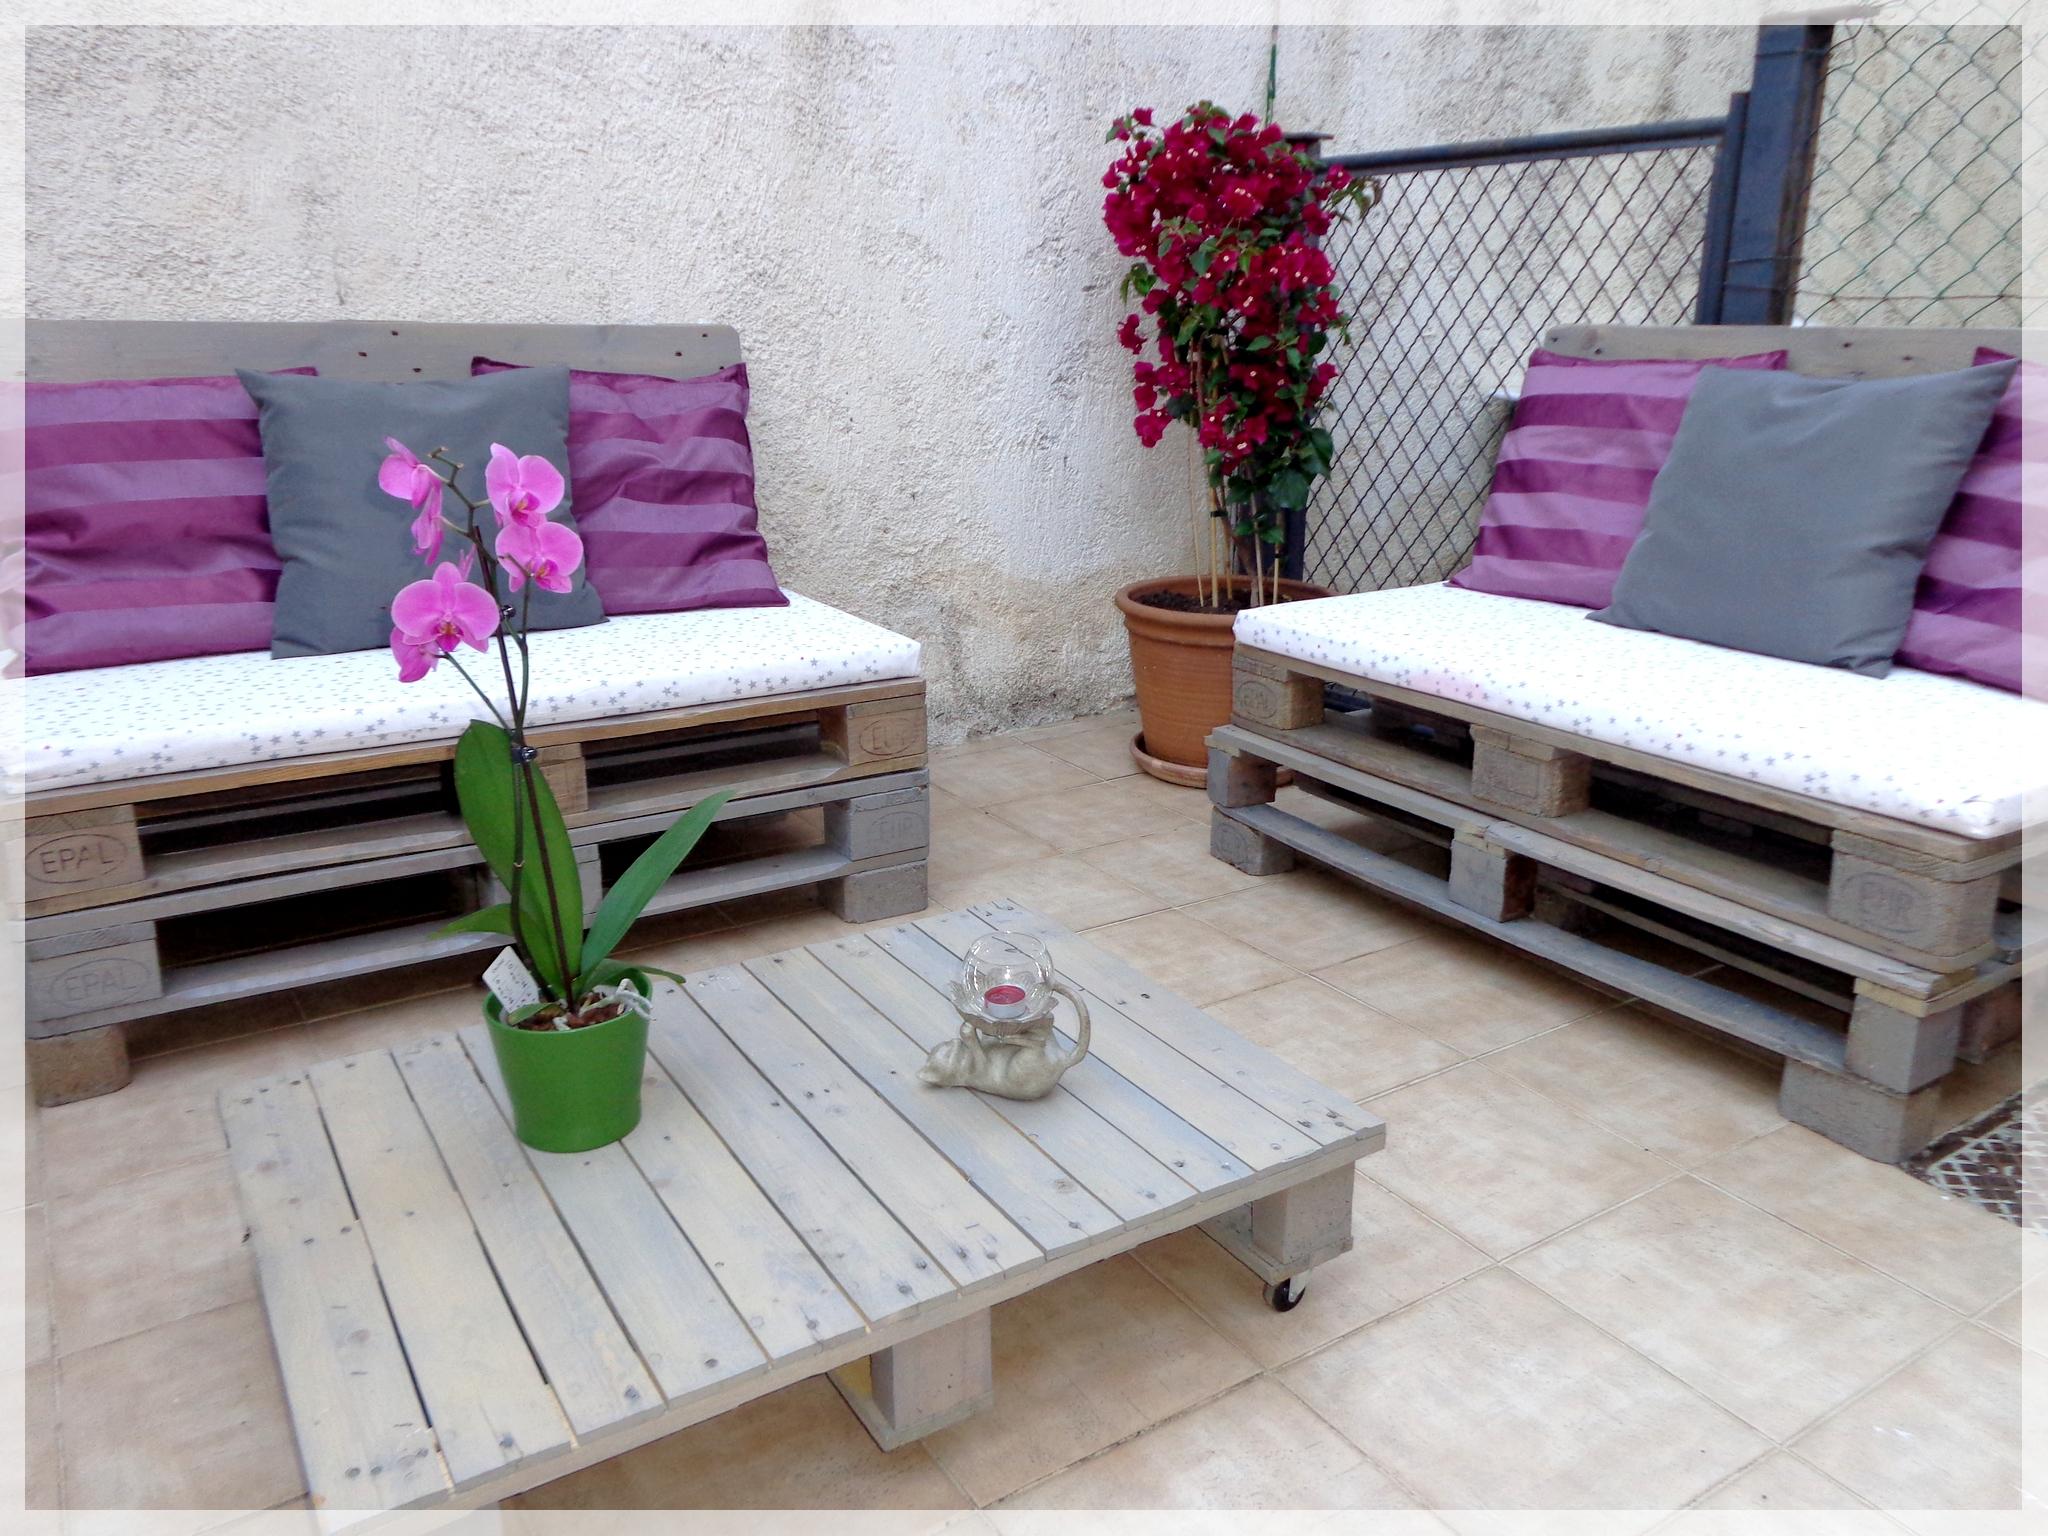 Diy - Salon De Jardin - La Patte De Notablueta destiné Canapé De Jardin En Palette